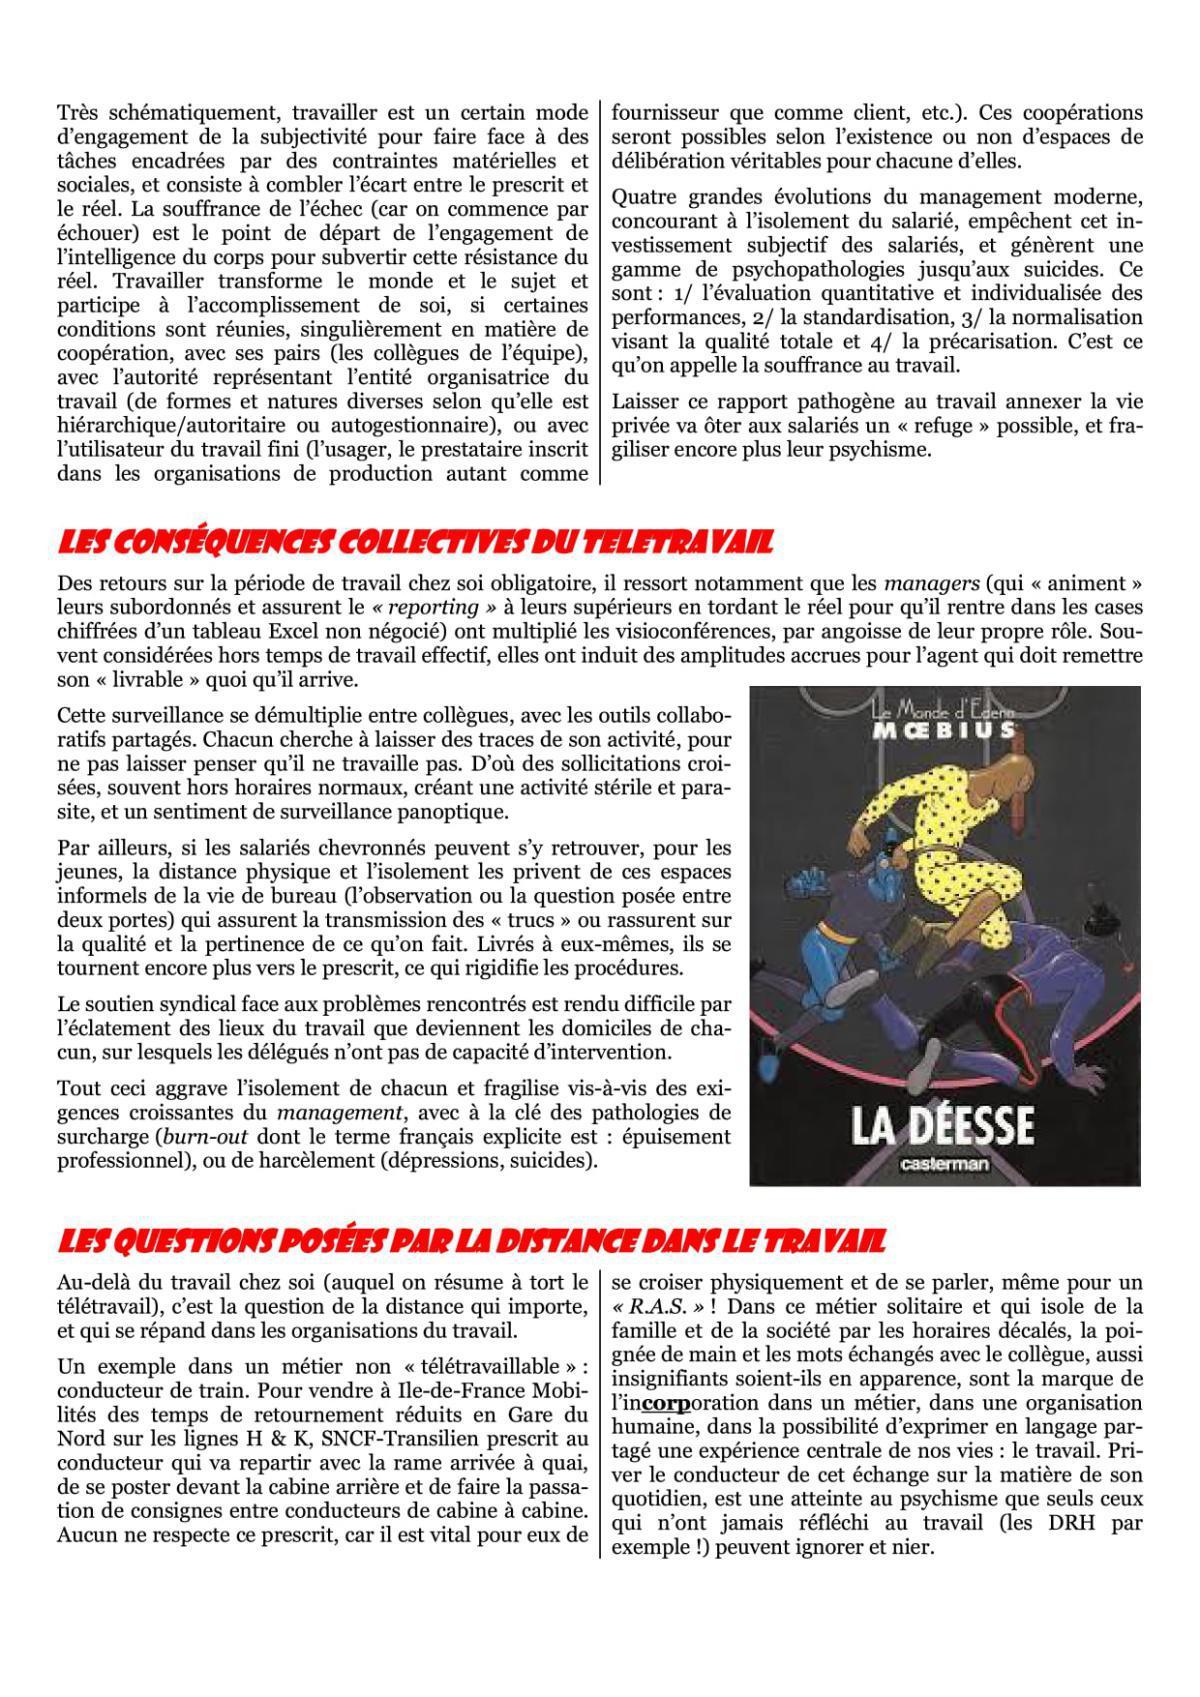 Journal Ici & Demain spécial Télétravail